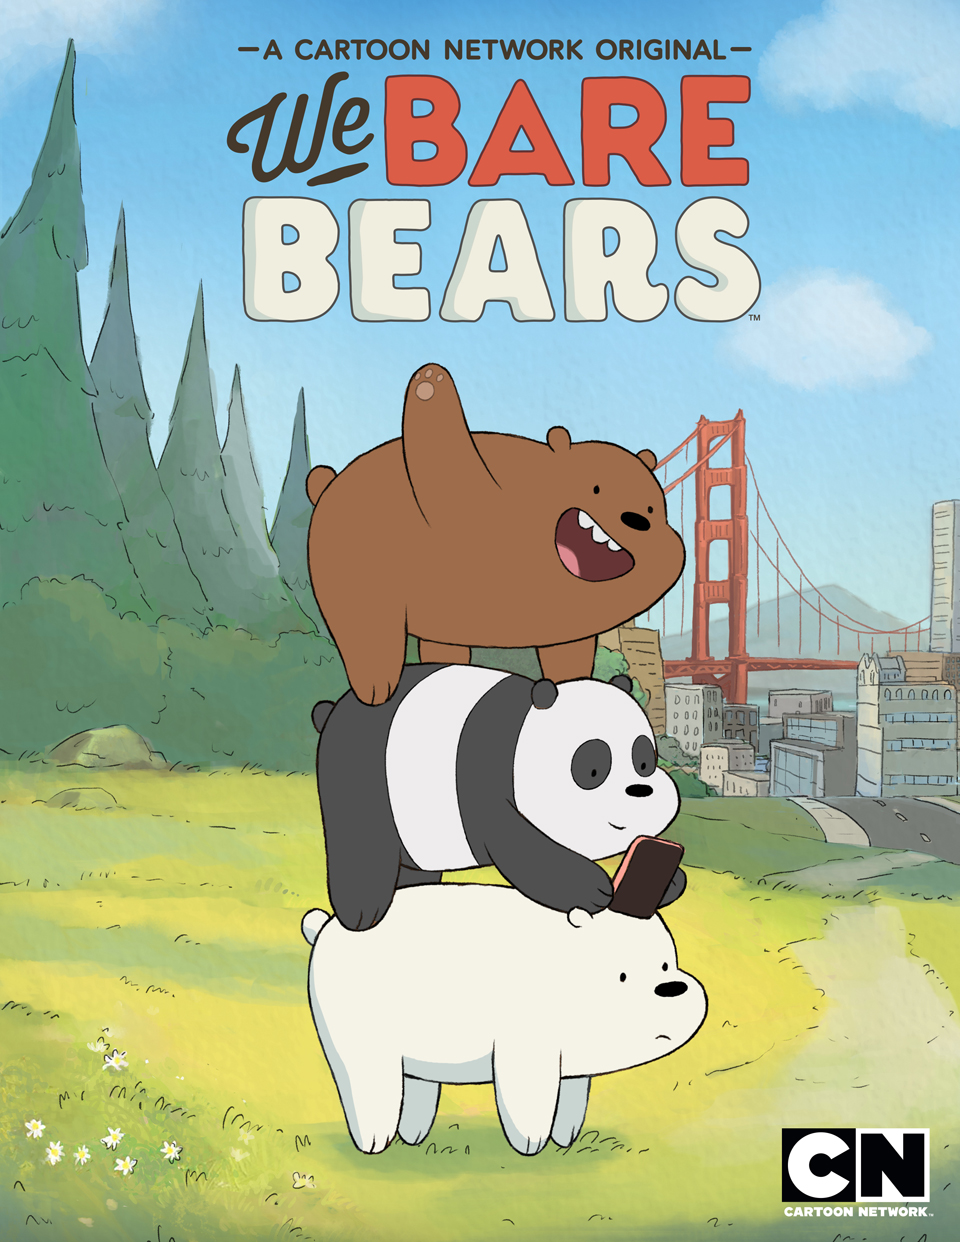 We Bare Bears We Bare Bears Wiki FANDOM Powered By Wikia - 32 bears decided try human